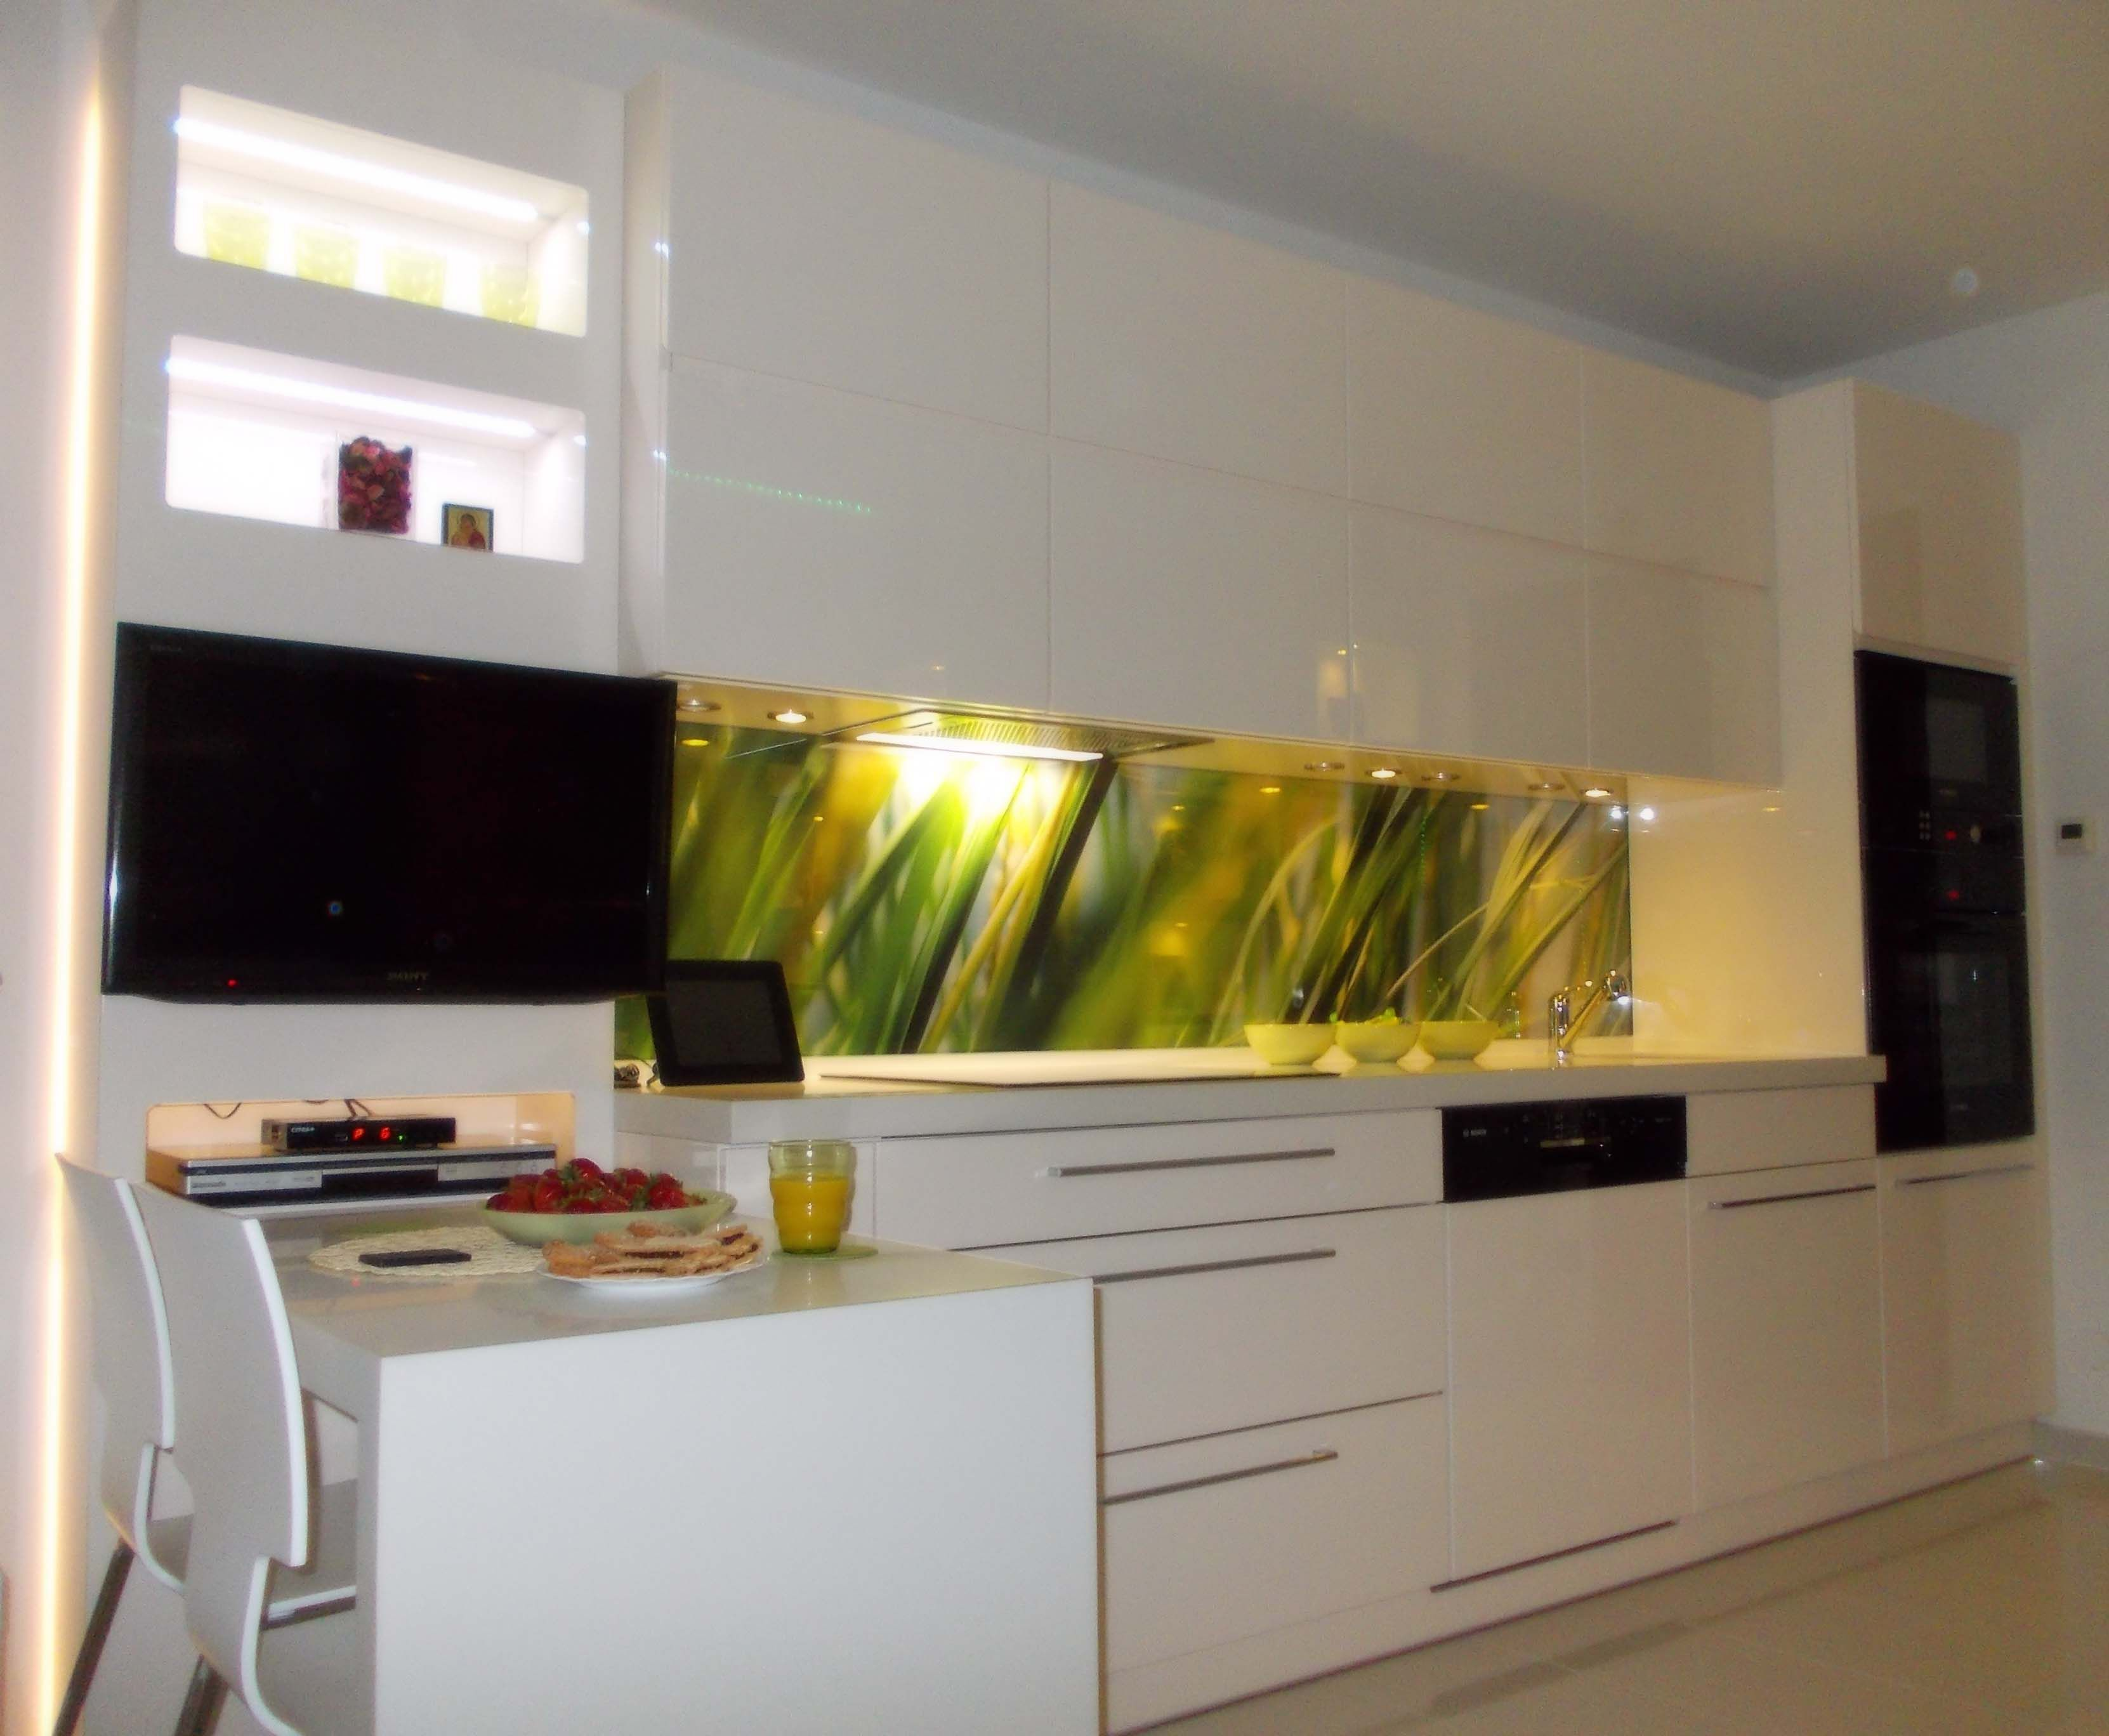 kuchnia przechodnia  Interior design  Pinterest  Interiors -> Kuchnia Orzech Polysk